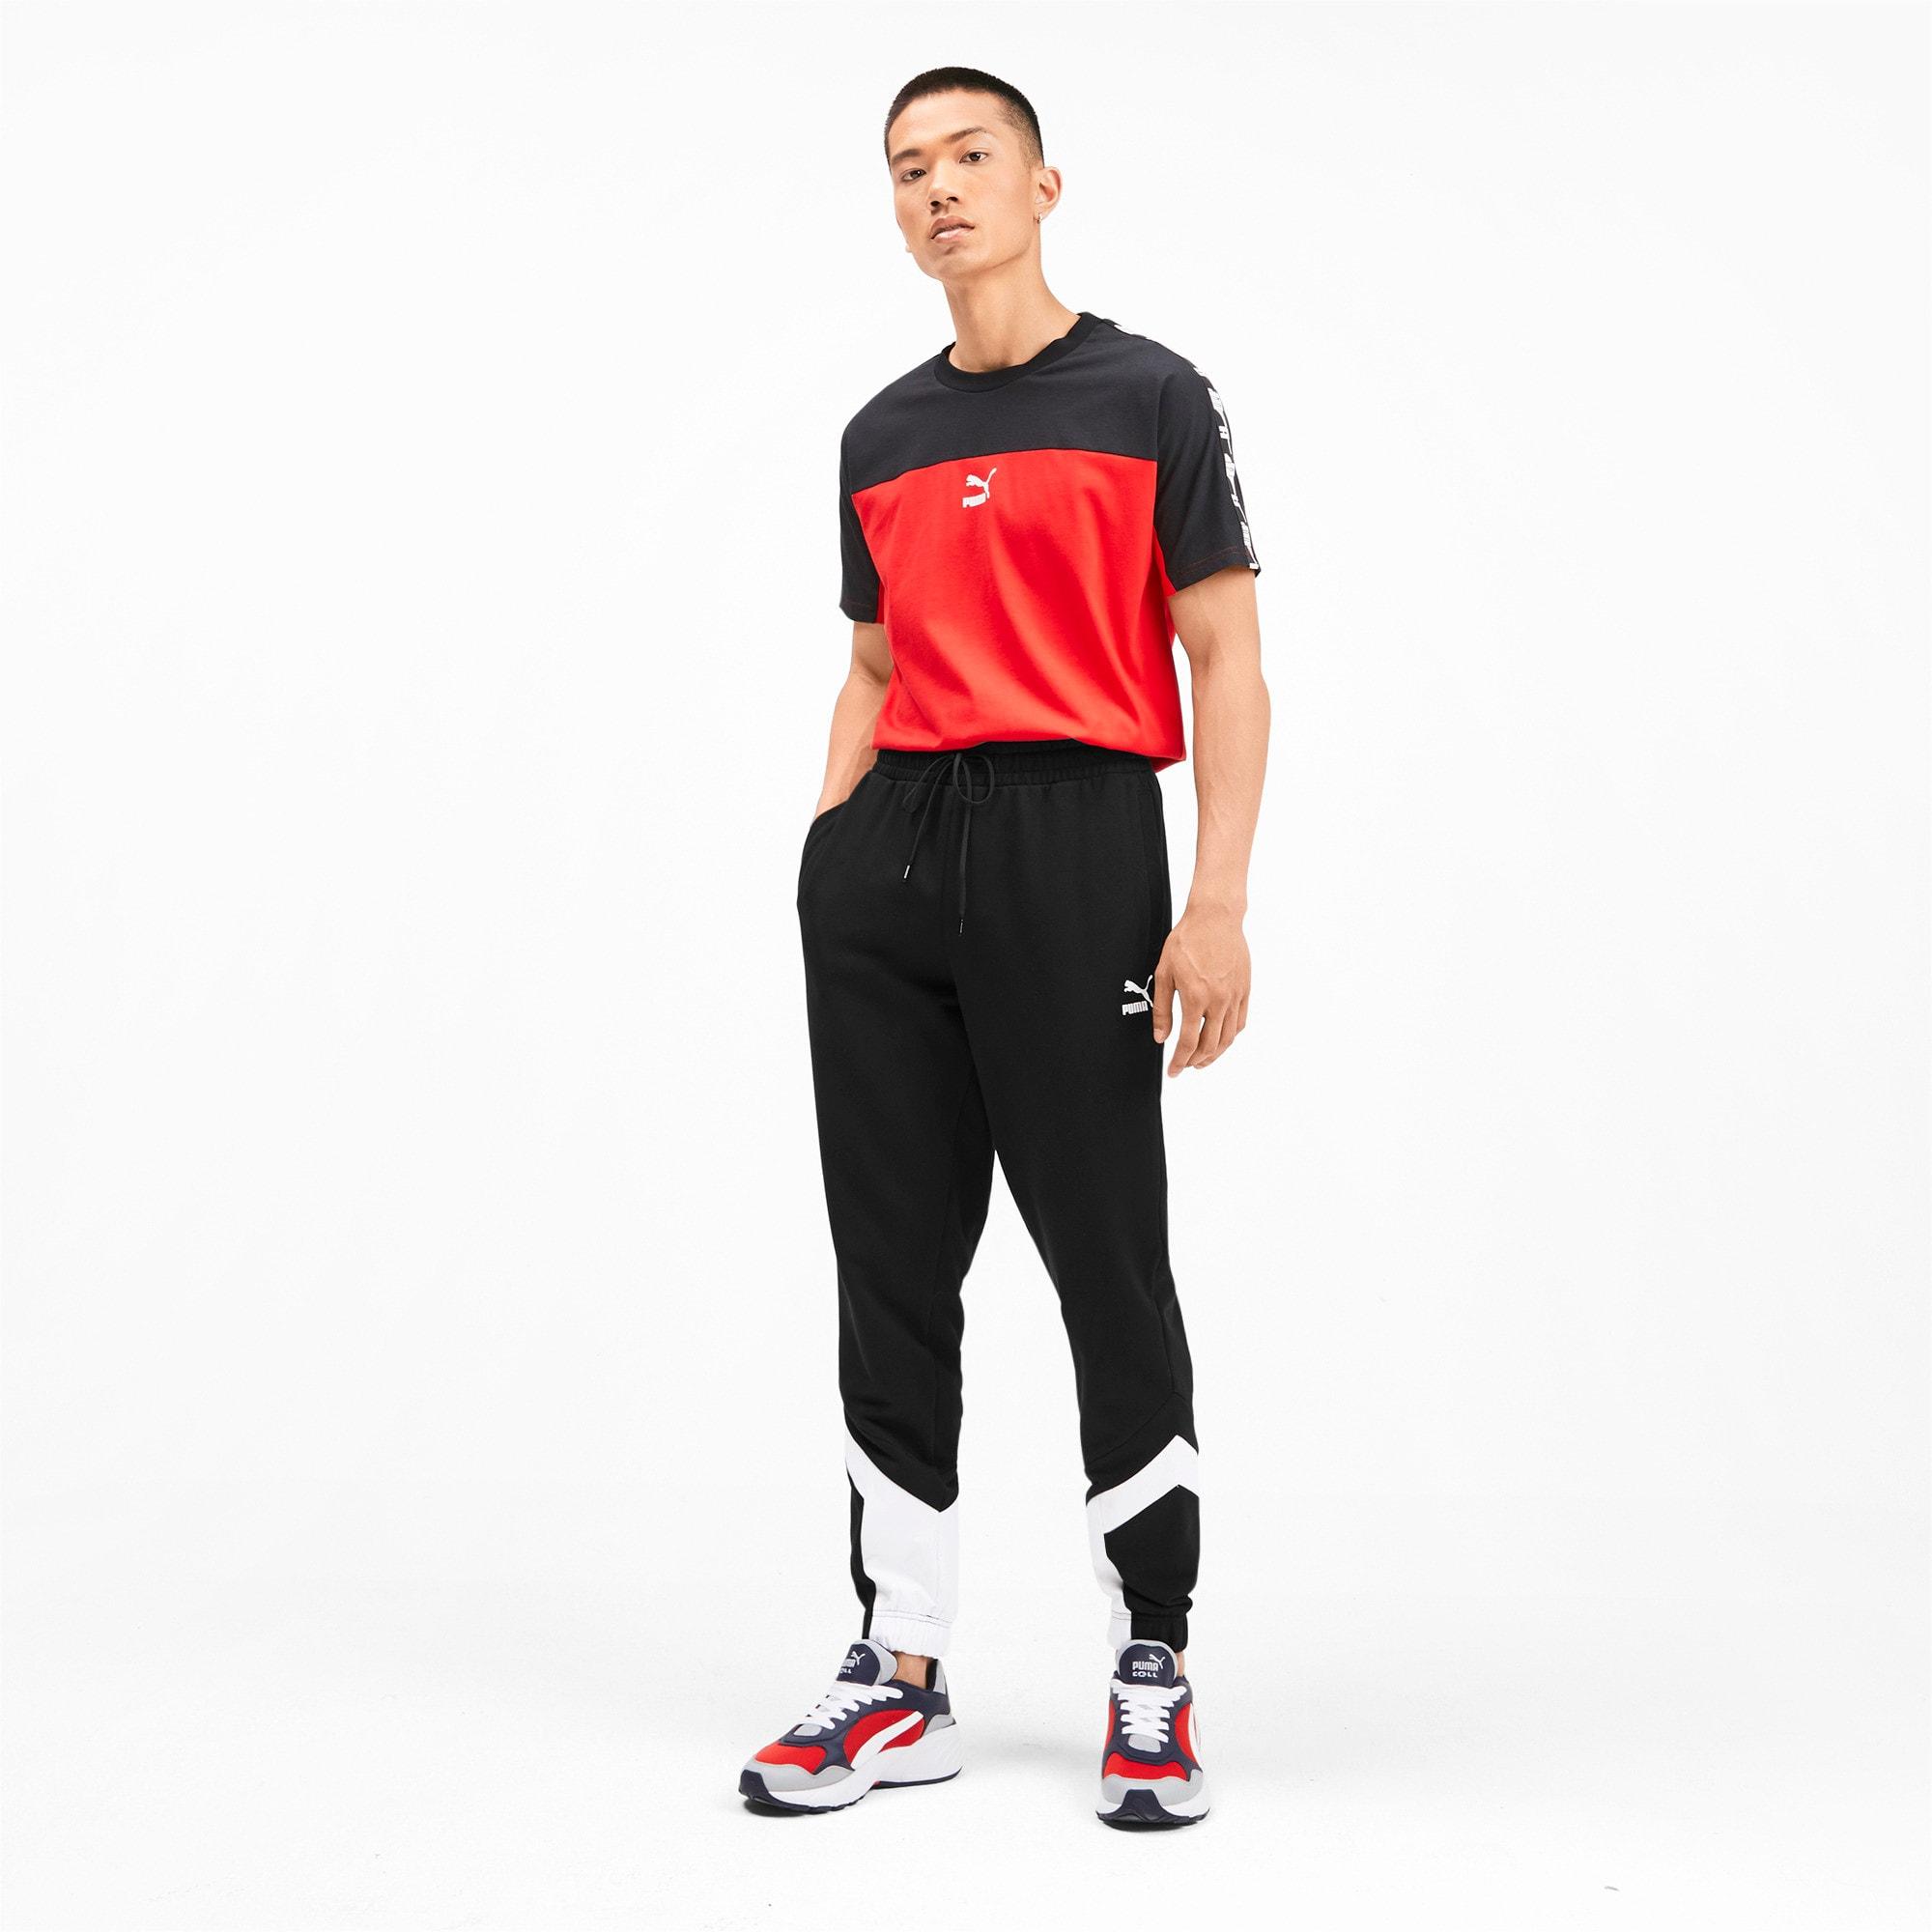 Miniatura 4 de Pantalones deportivos Iconic MCS de hombre, Puma Black, mediano